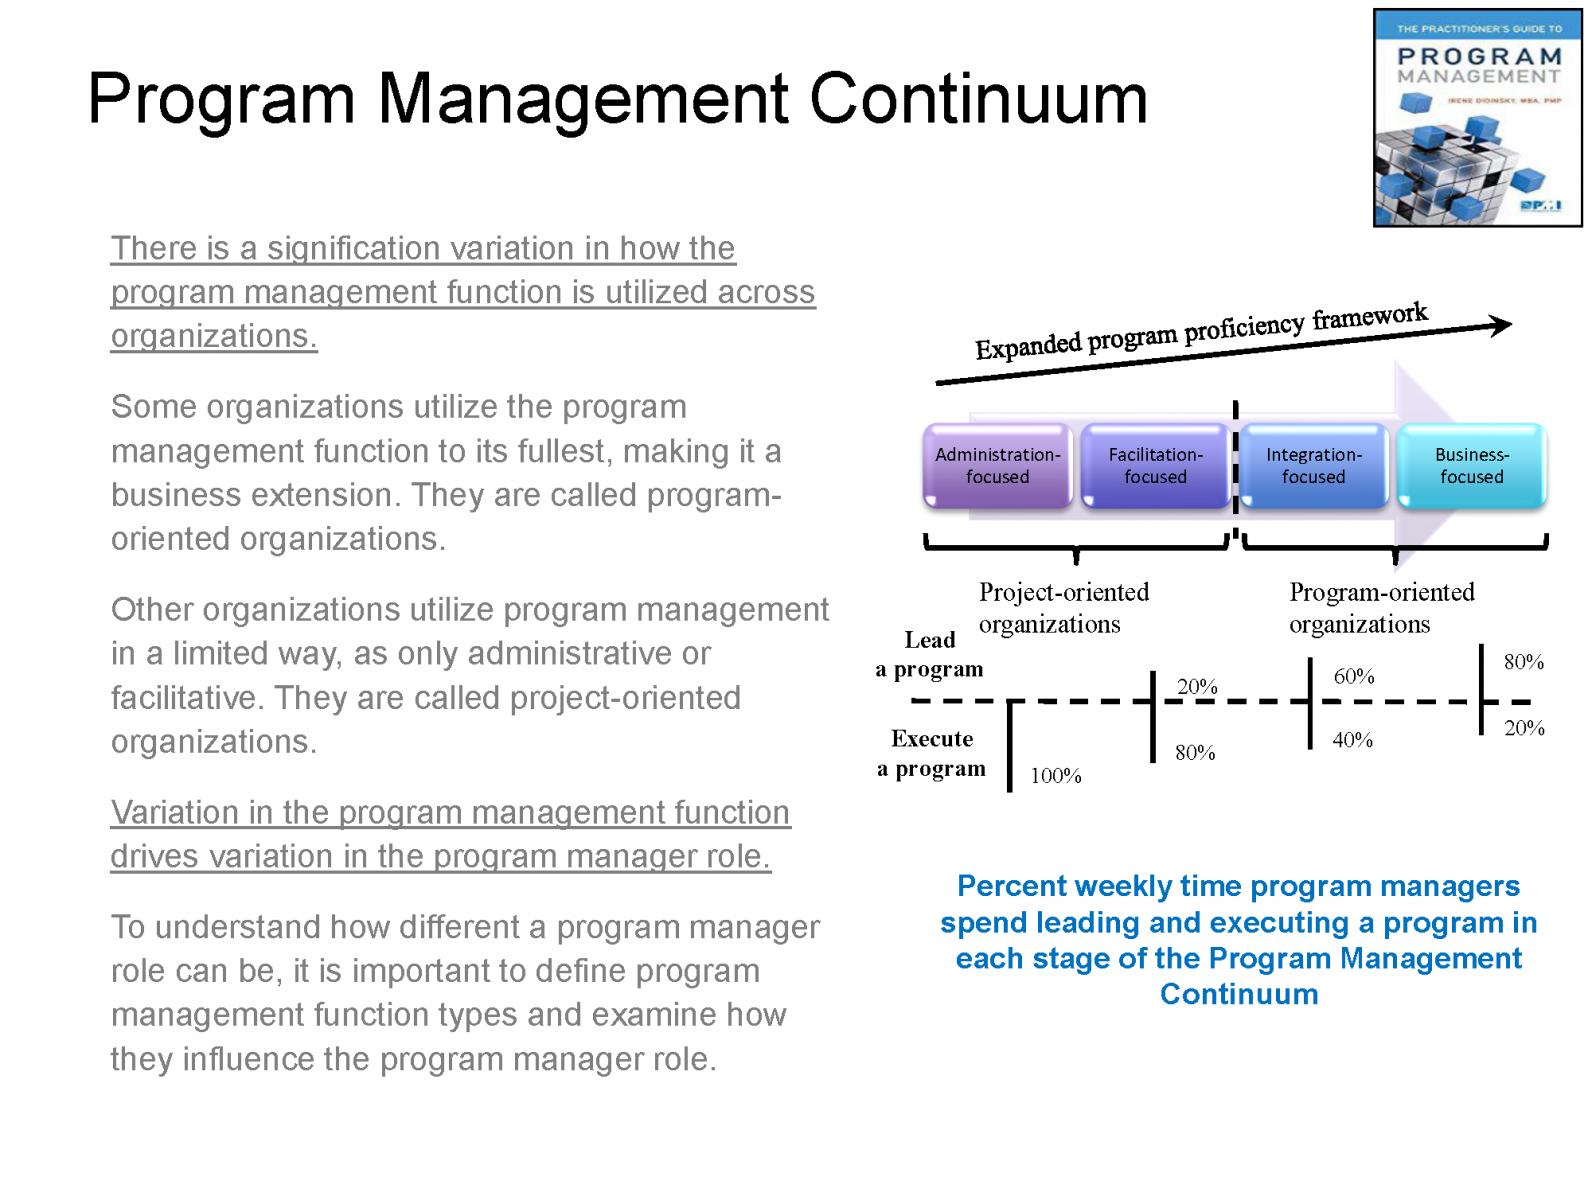 ProjectManagementcom webinar_Irene Didinsky_03282018_v01 (1)_Page_11